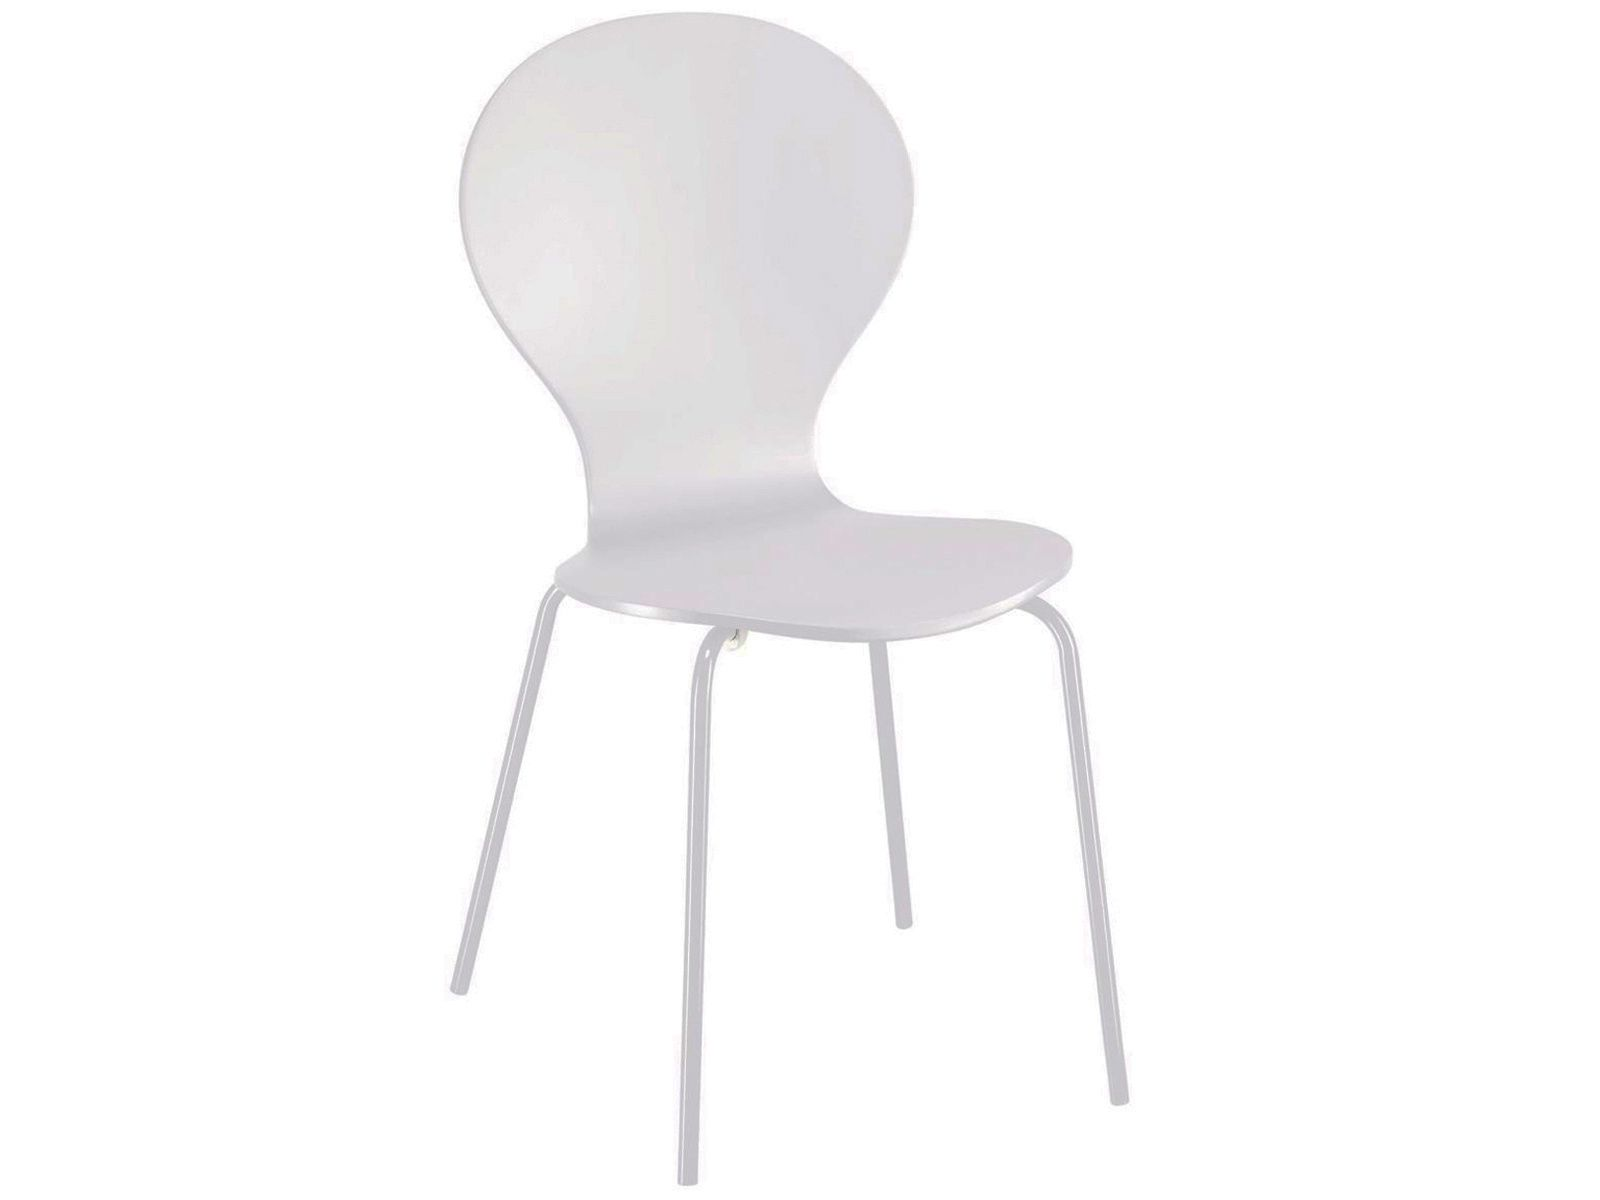 Chaise Fourmis Finest Beautiful Chaise Fourmi Coloris